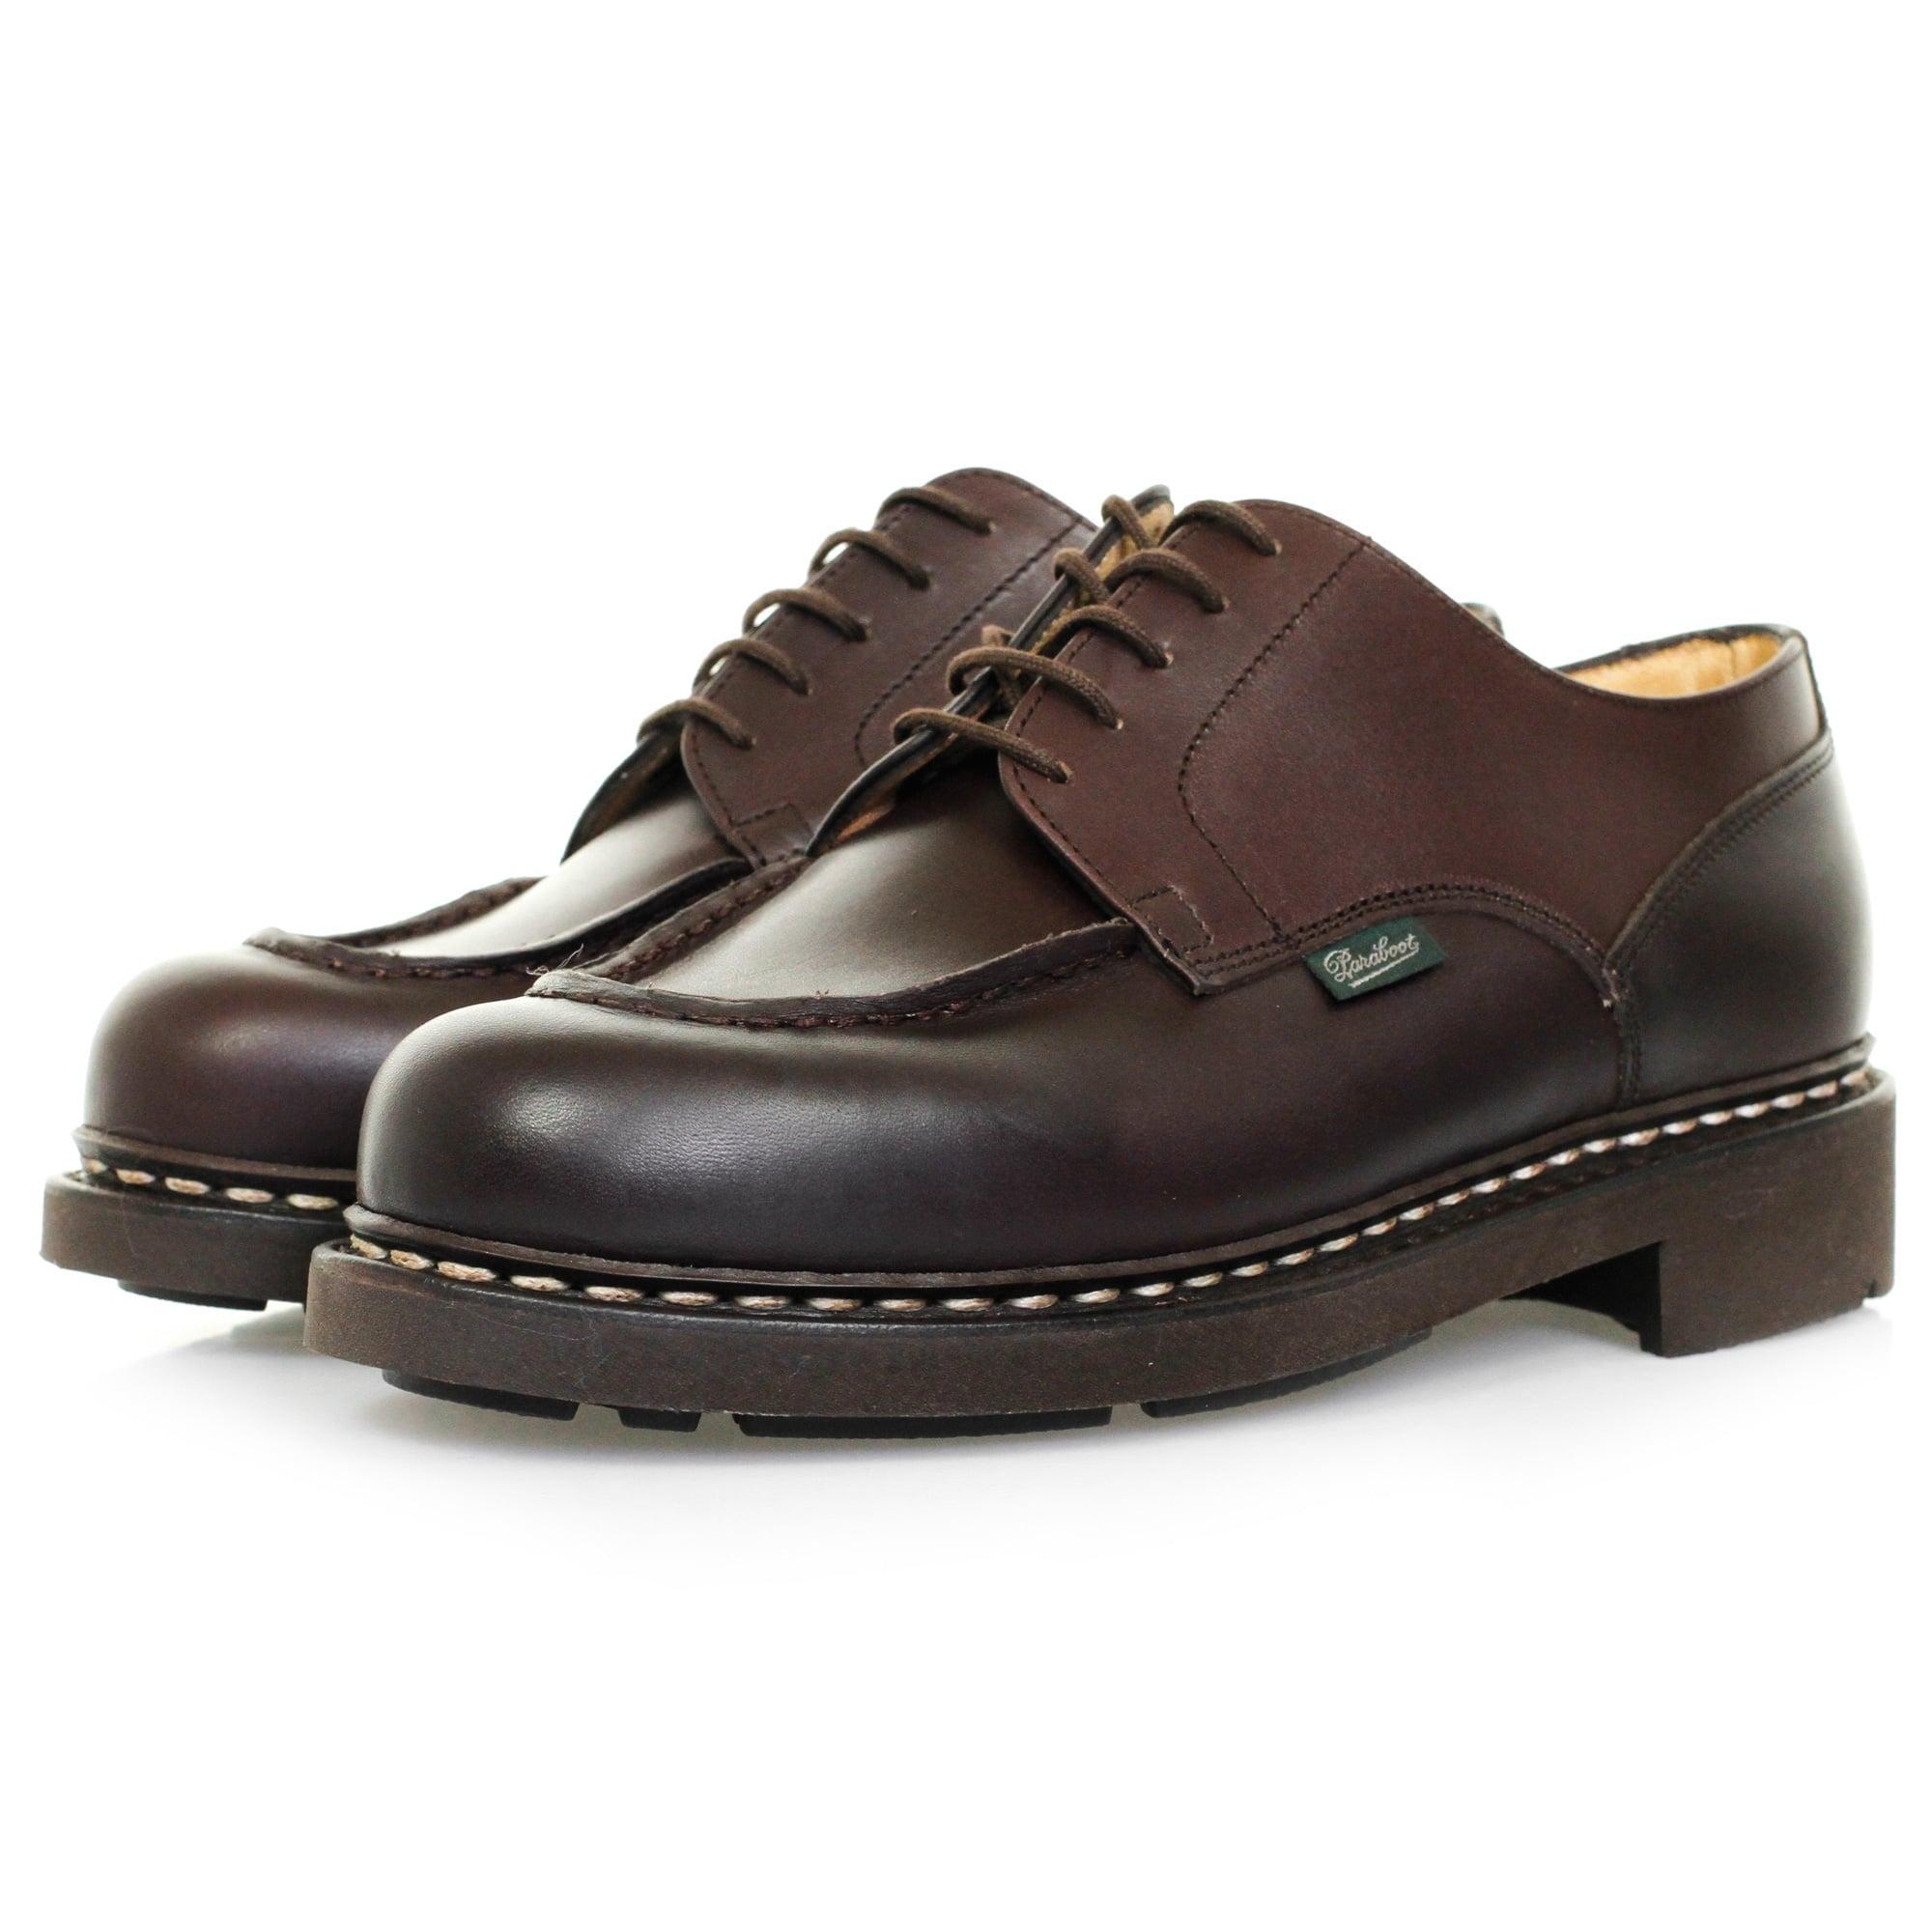 Paraboot Chambord Cafe Shoe for Men